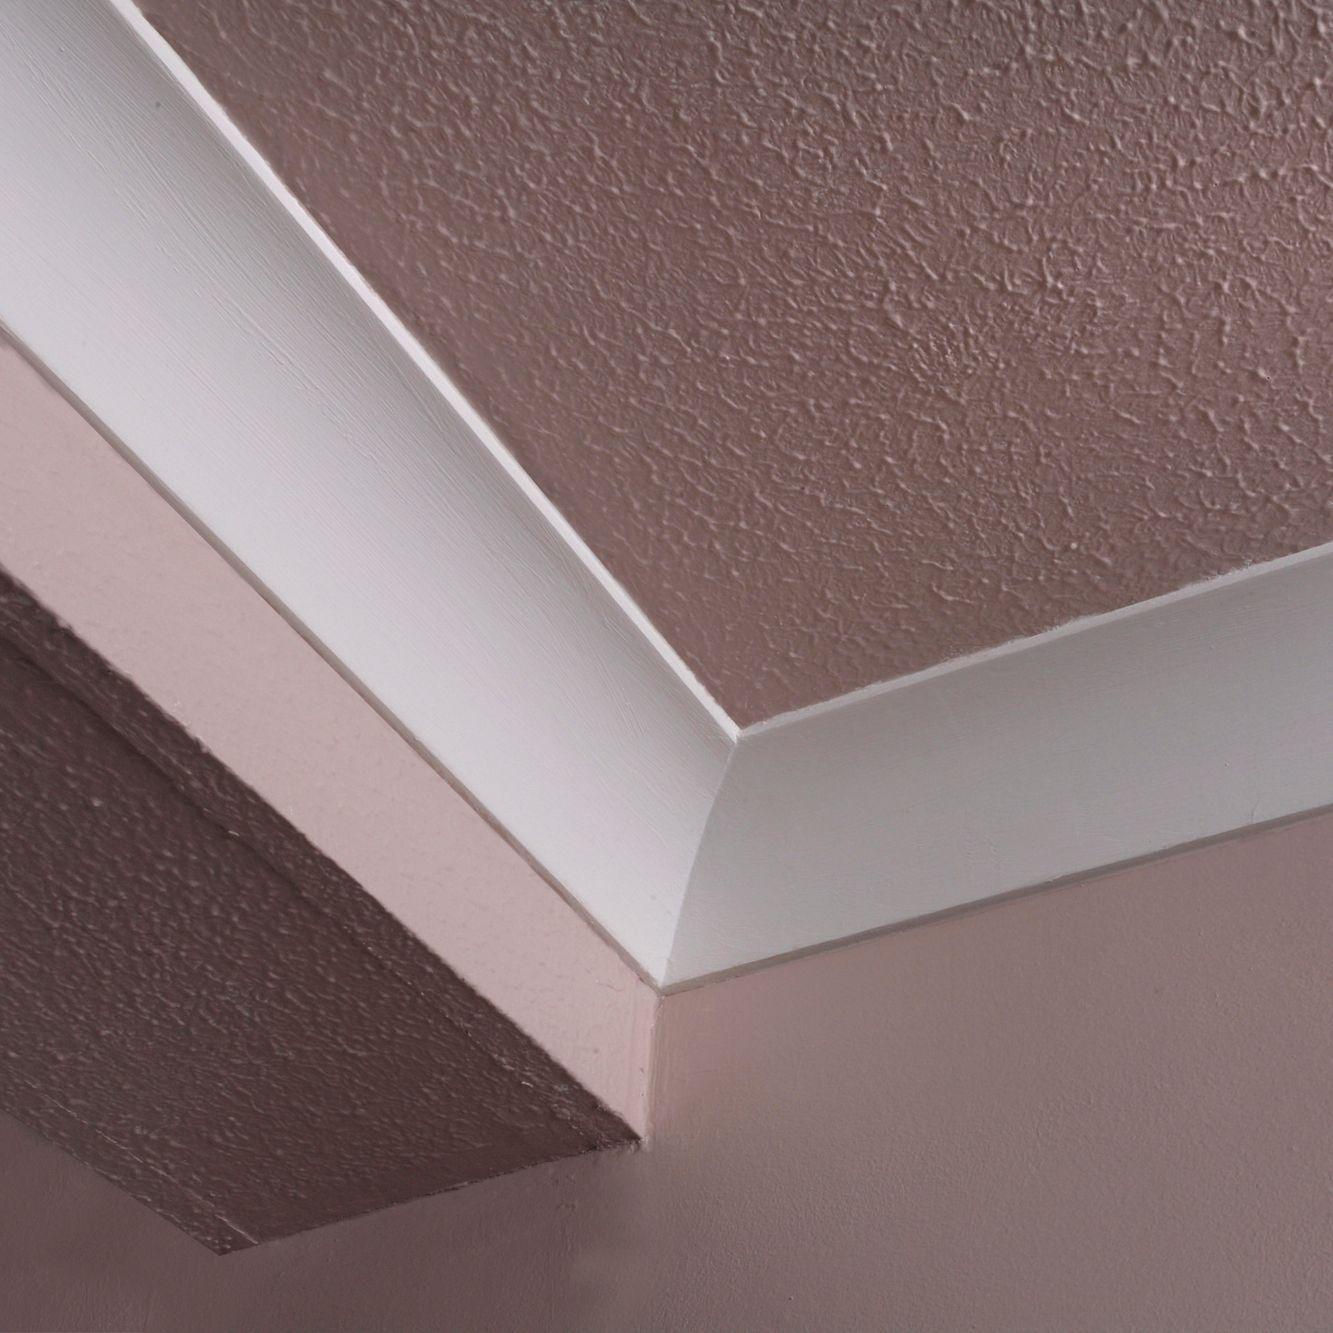 supercove c profile polyurethane coving pack of 12. Black Bedroom Furniture Sets. Home Design Ideas